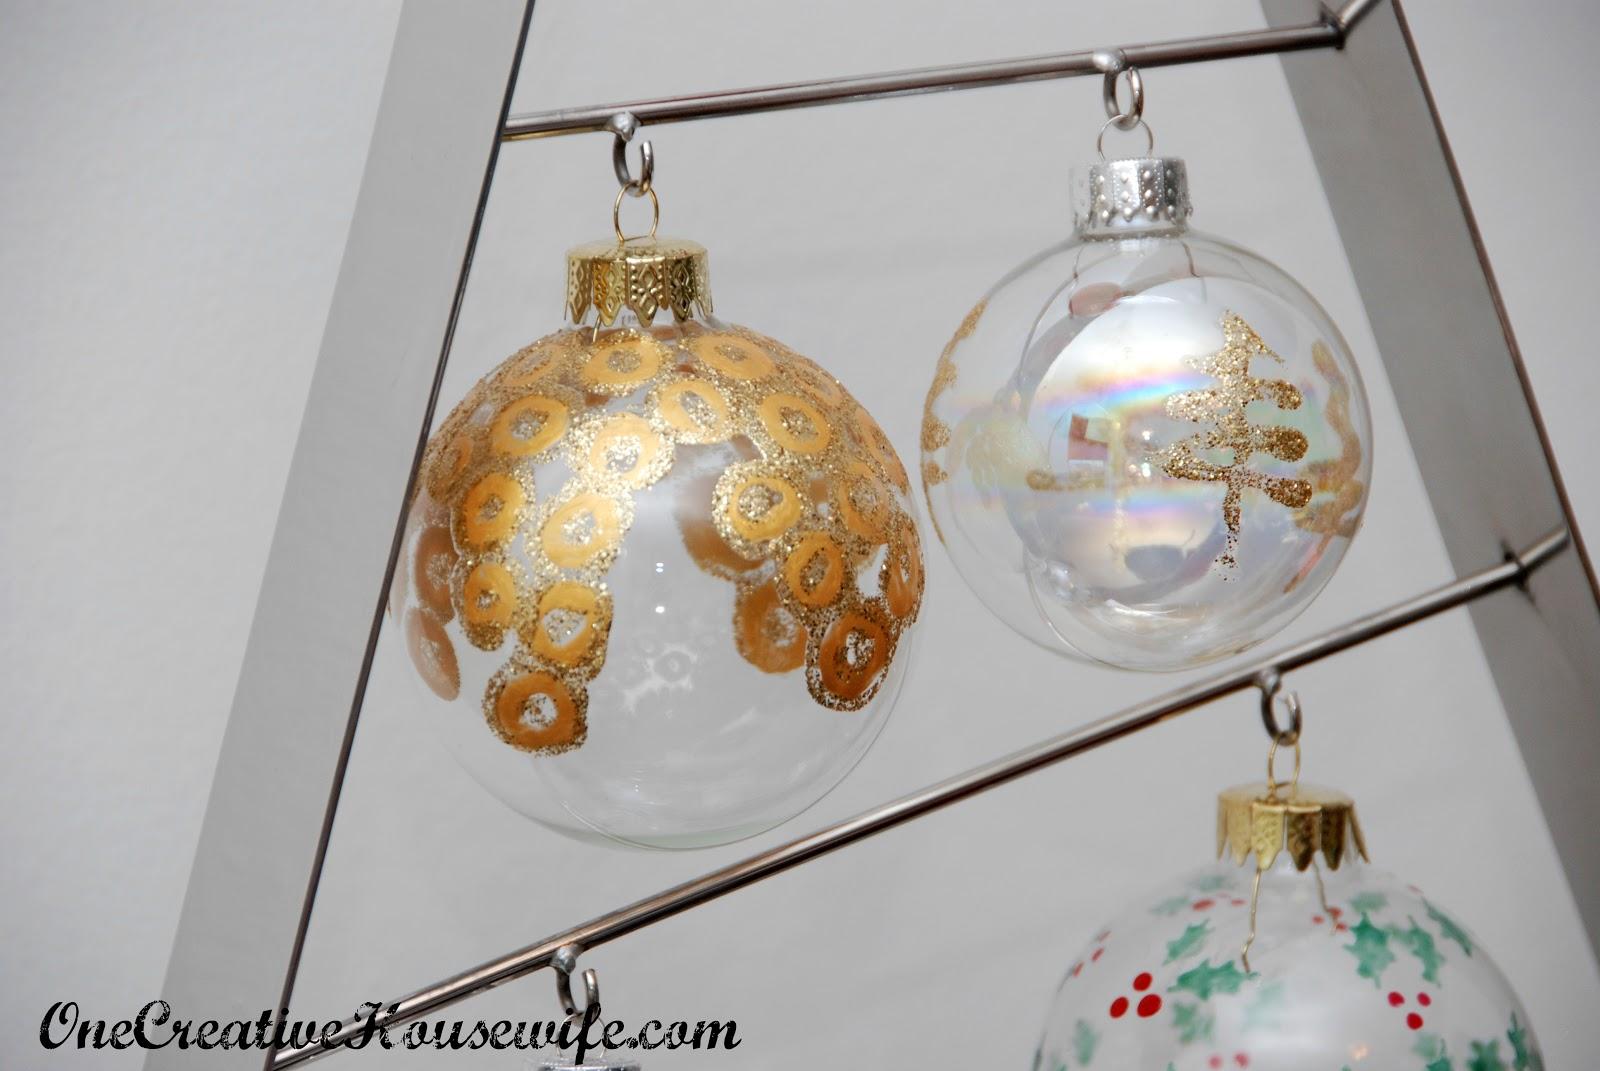 One Creative Housewife: DIY Christmas Ornaments